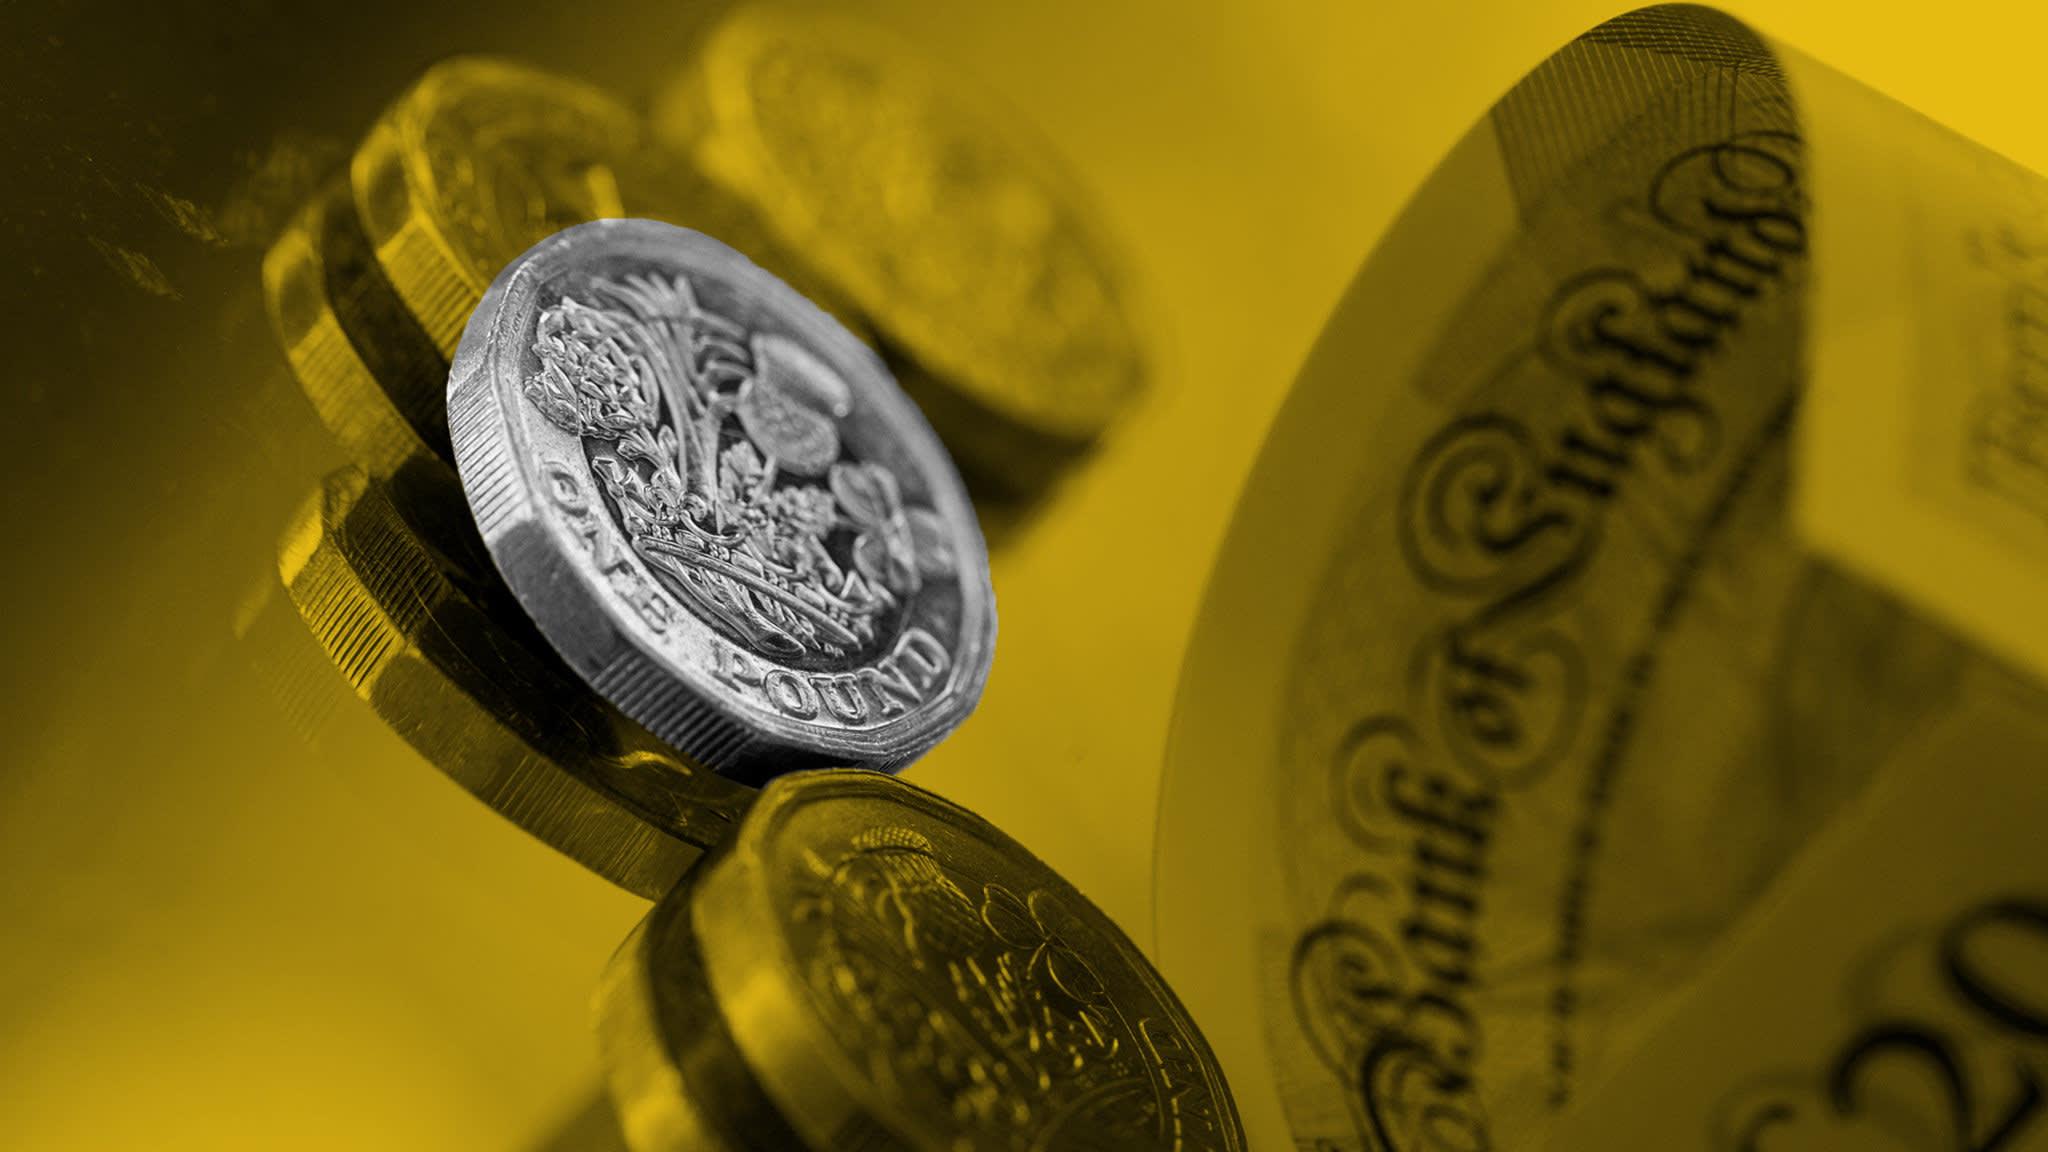 Momentum eyes lower fees post Seneca deal